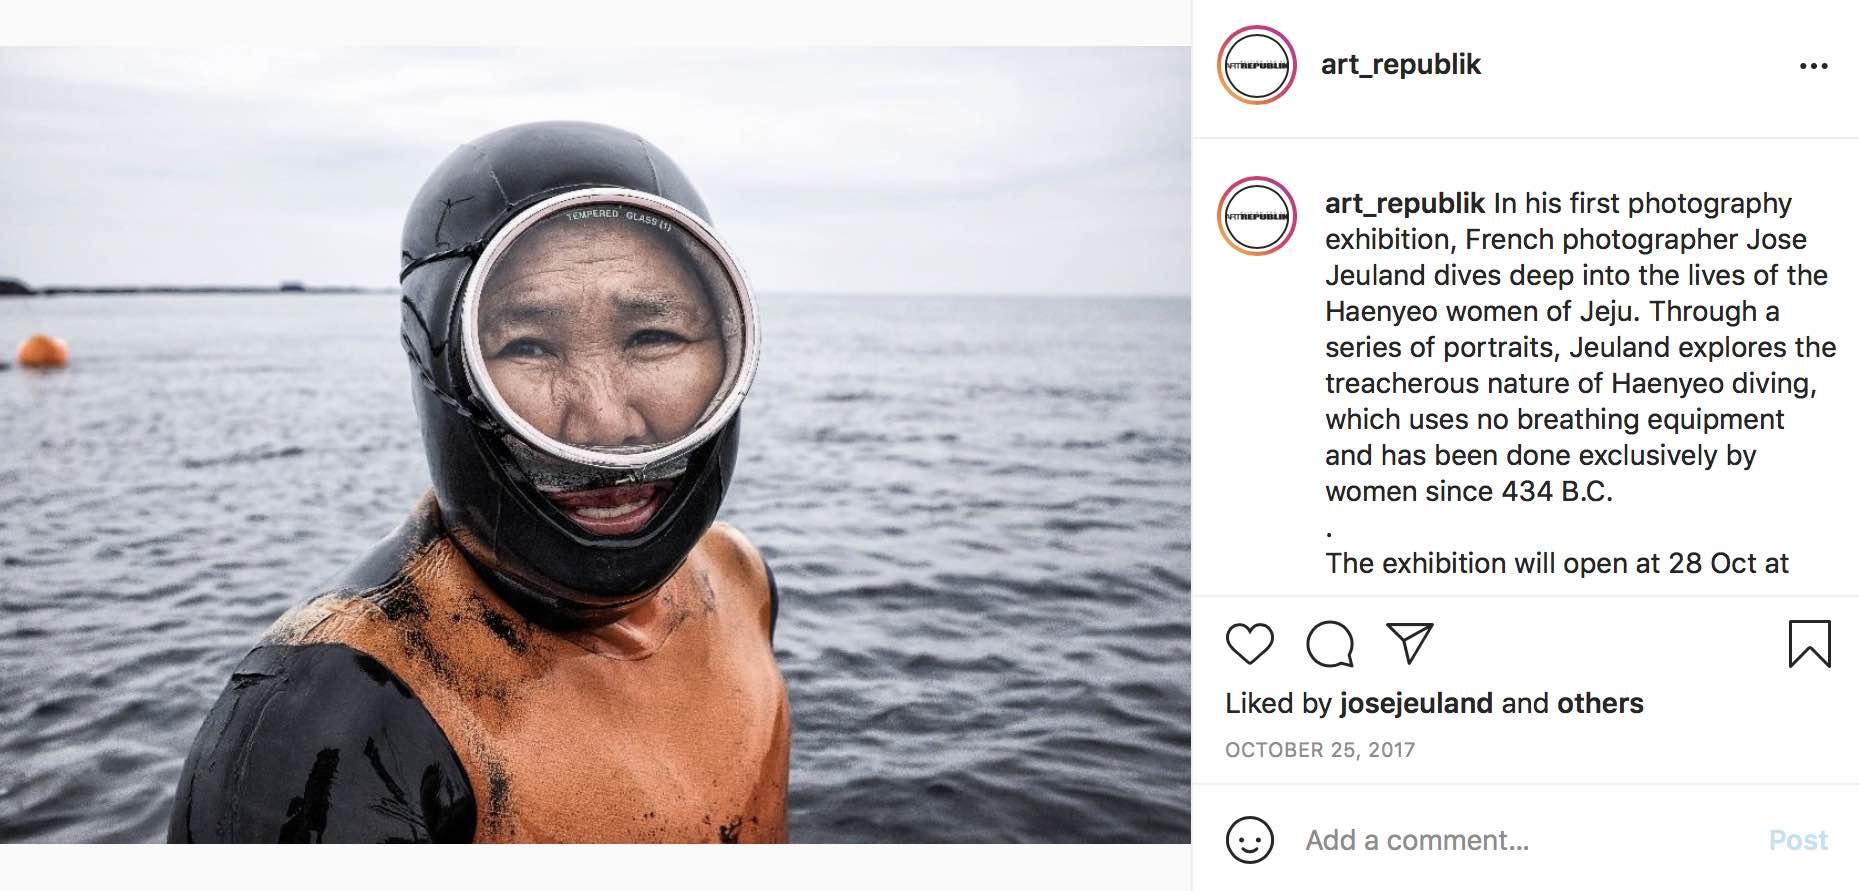 Art Republik Instagram Haenyeo Women Divers Jose Jeuland 1